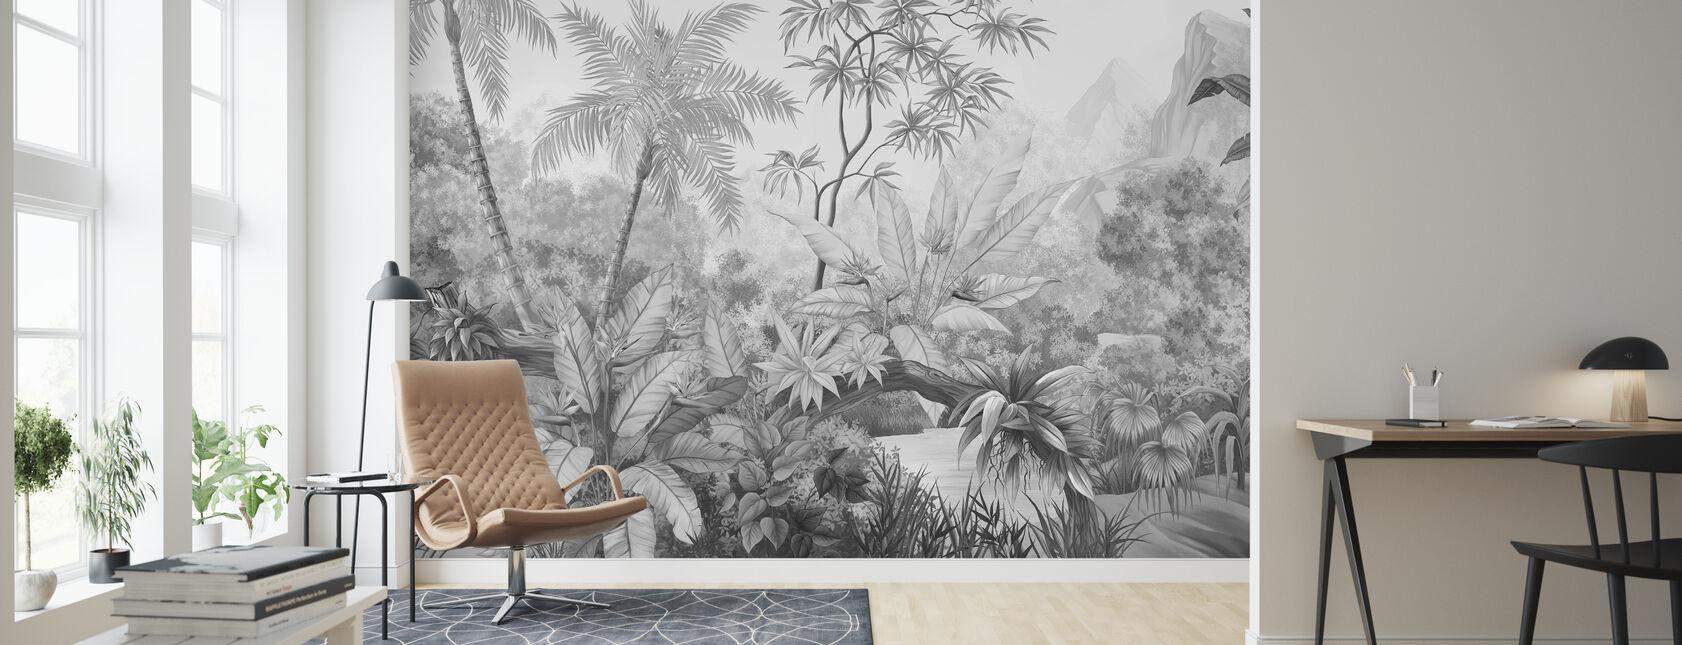 Jungle emmêlée - Bw - Papier peint - Salle à manger